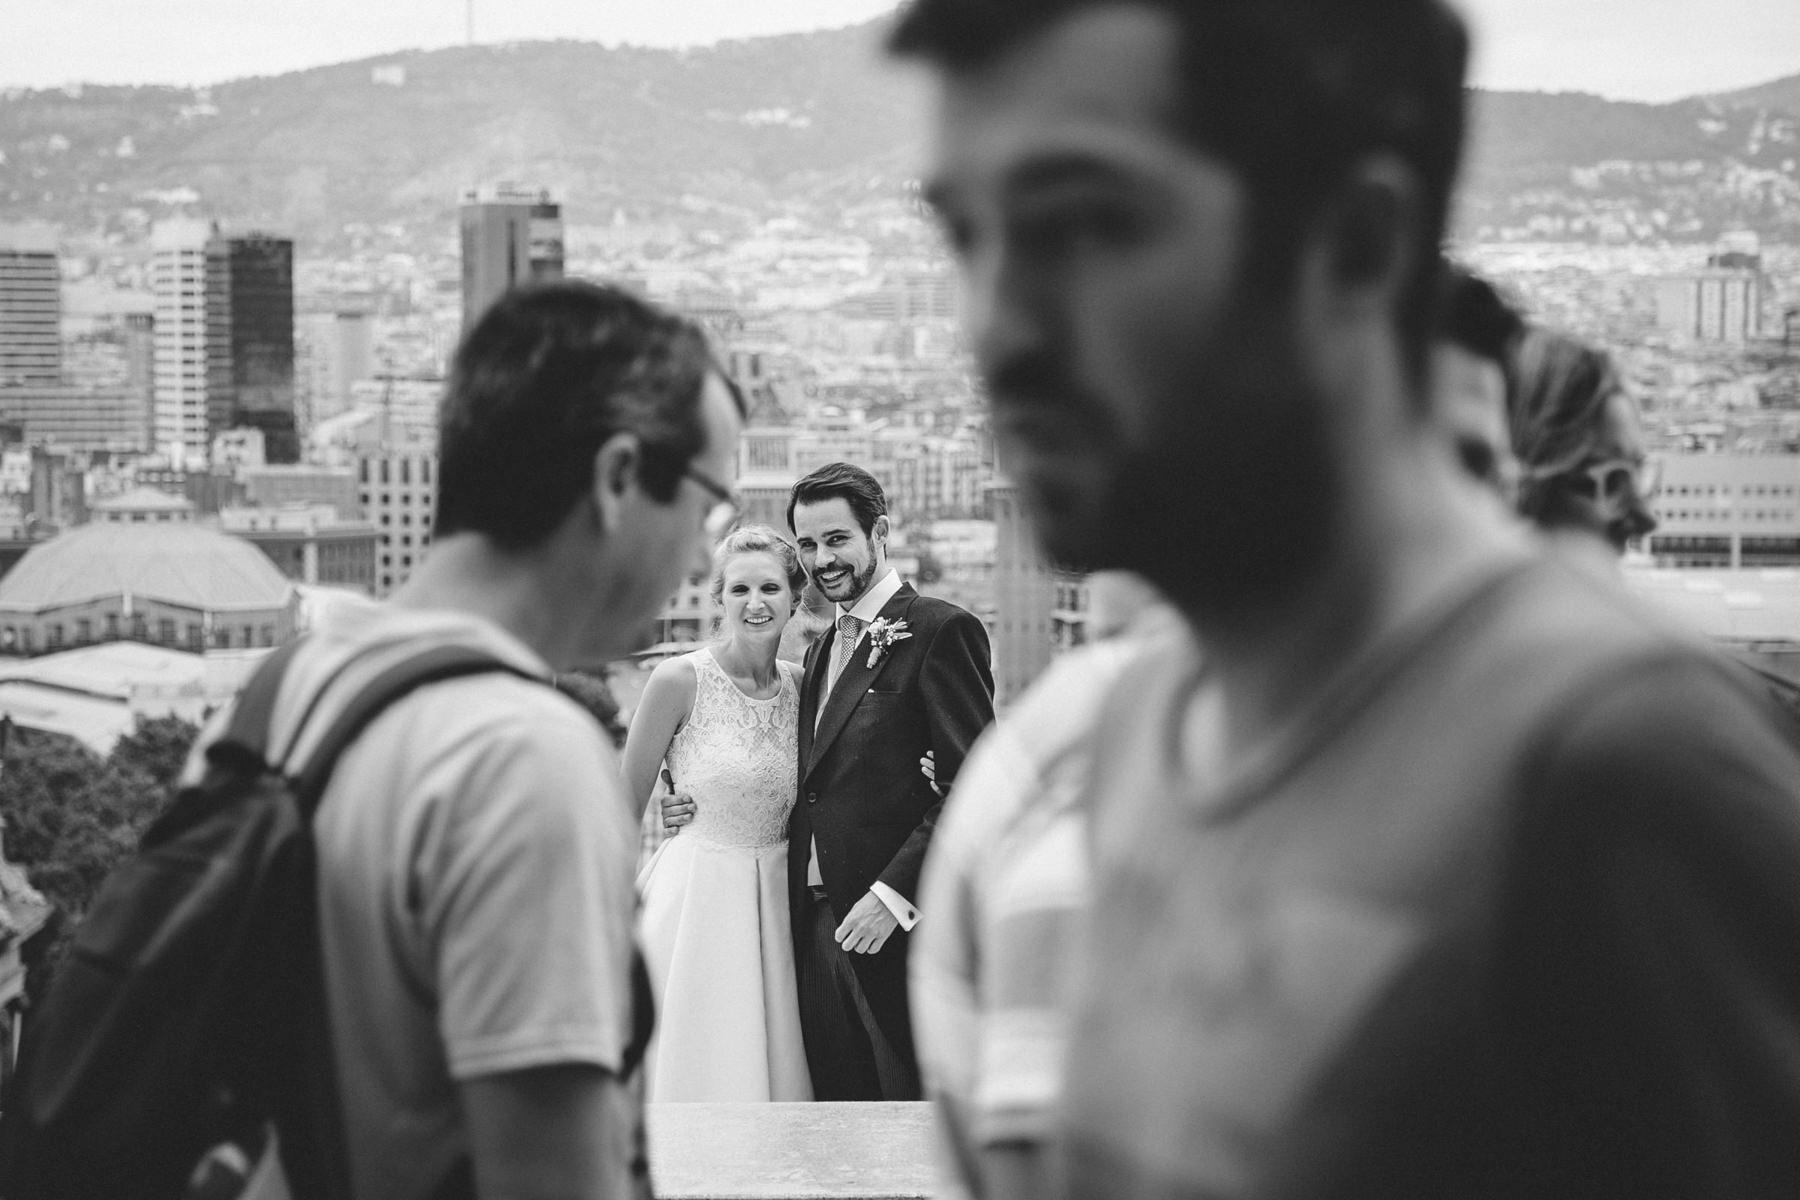 Wedding_Photography_Carlos_Hevia_Barcelona_Berlin_25.jpg